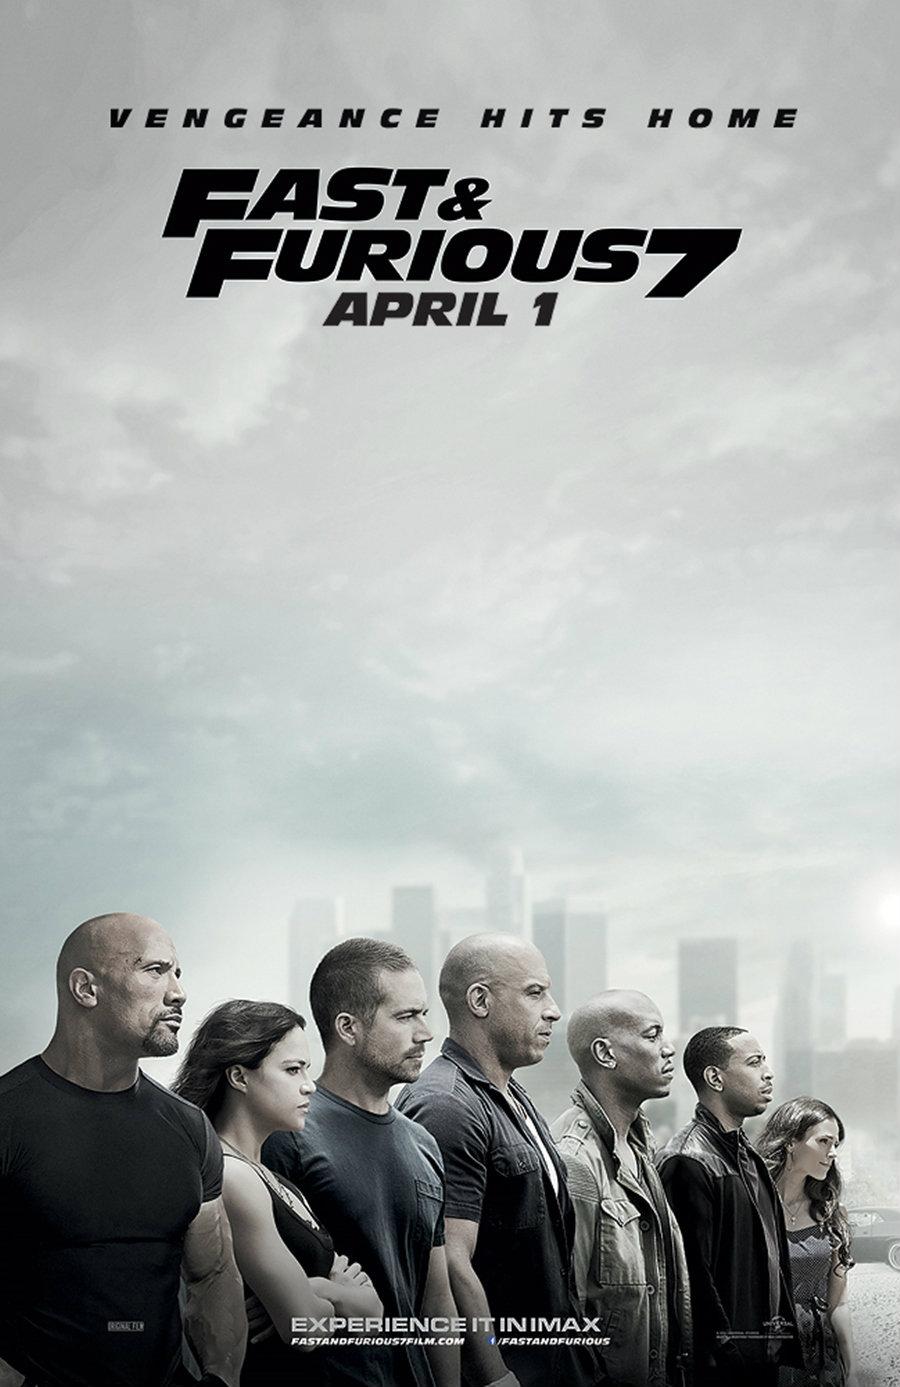 Fast & Furious 7 เร็ว..แรงทะลุนรก 7